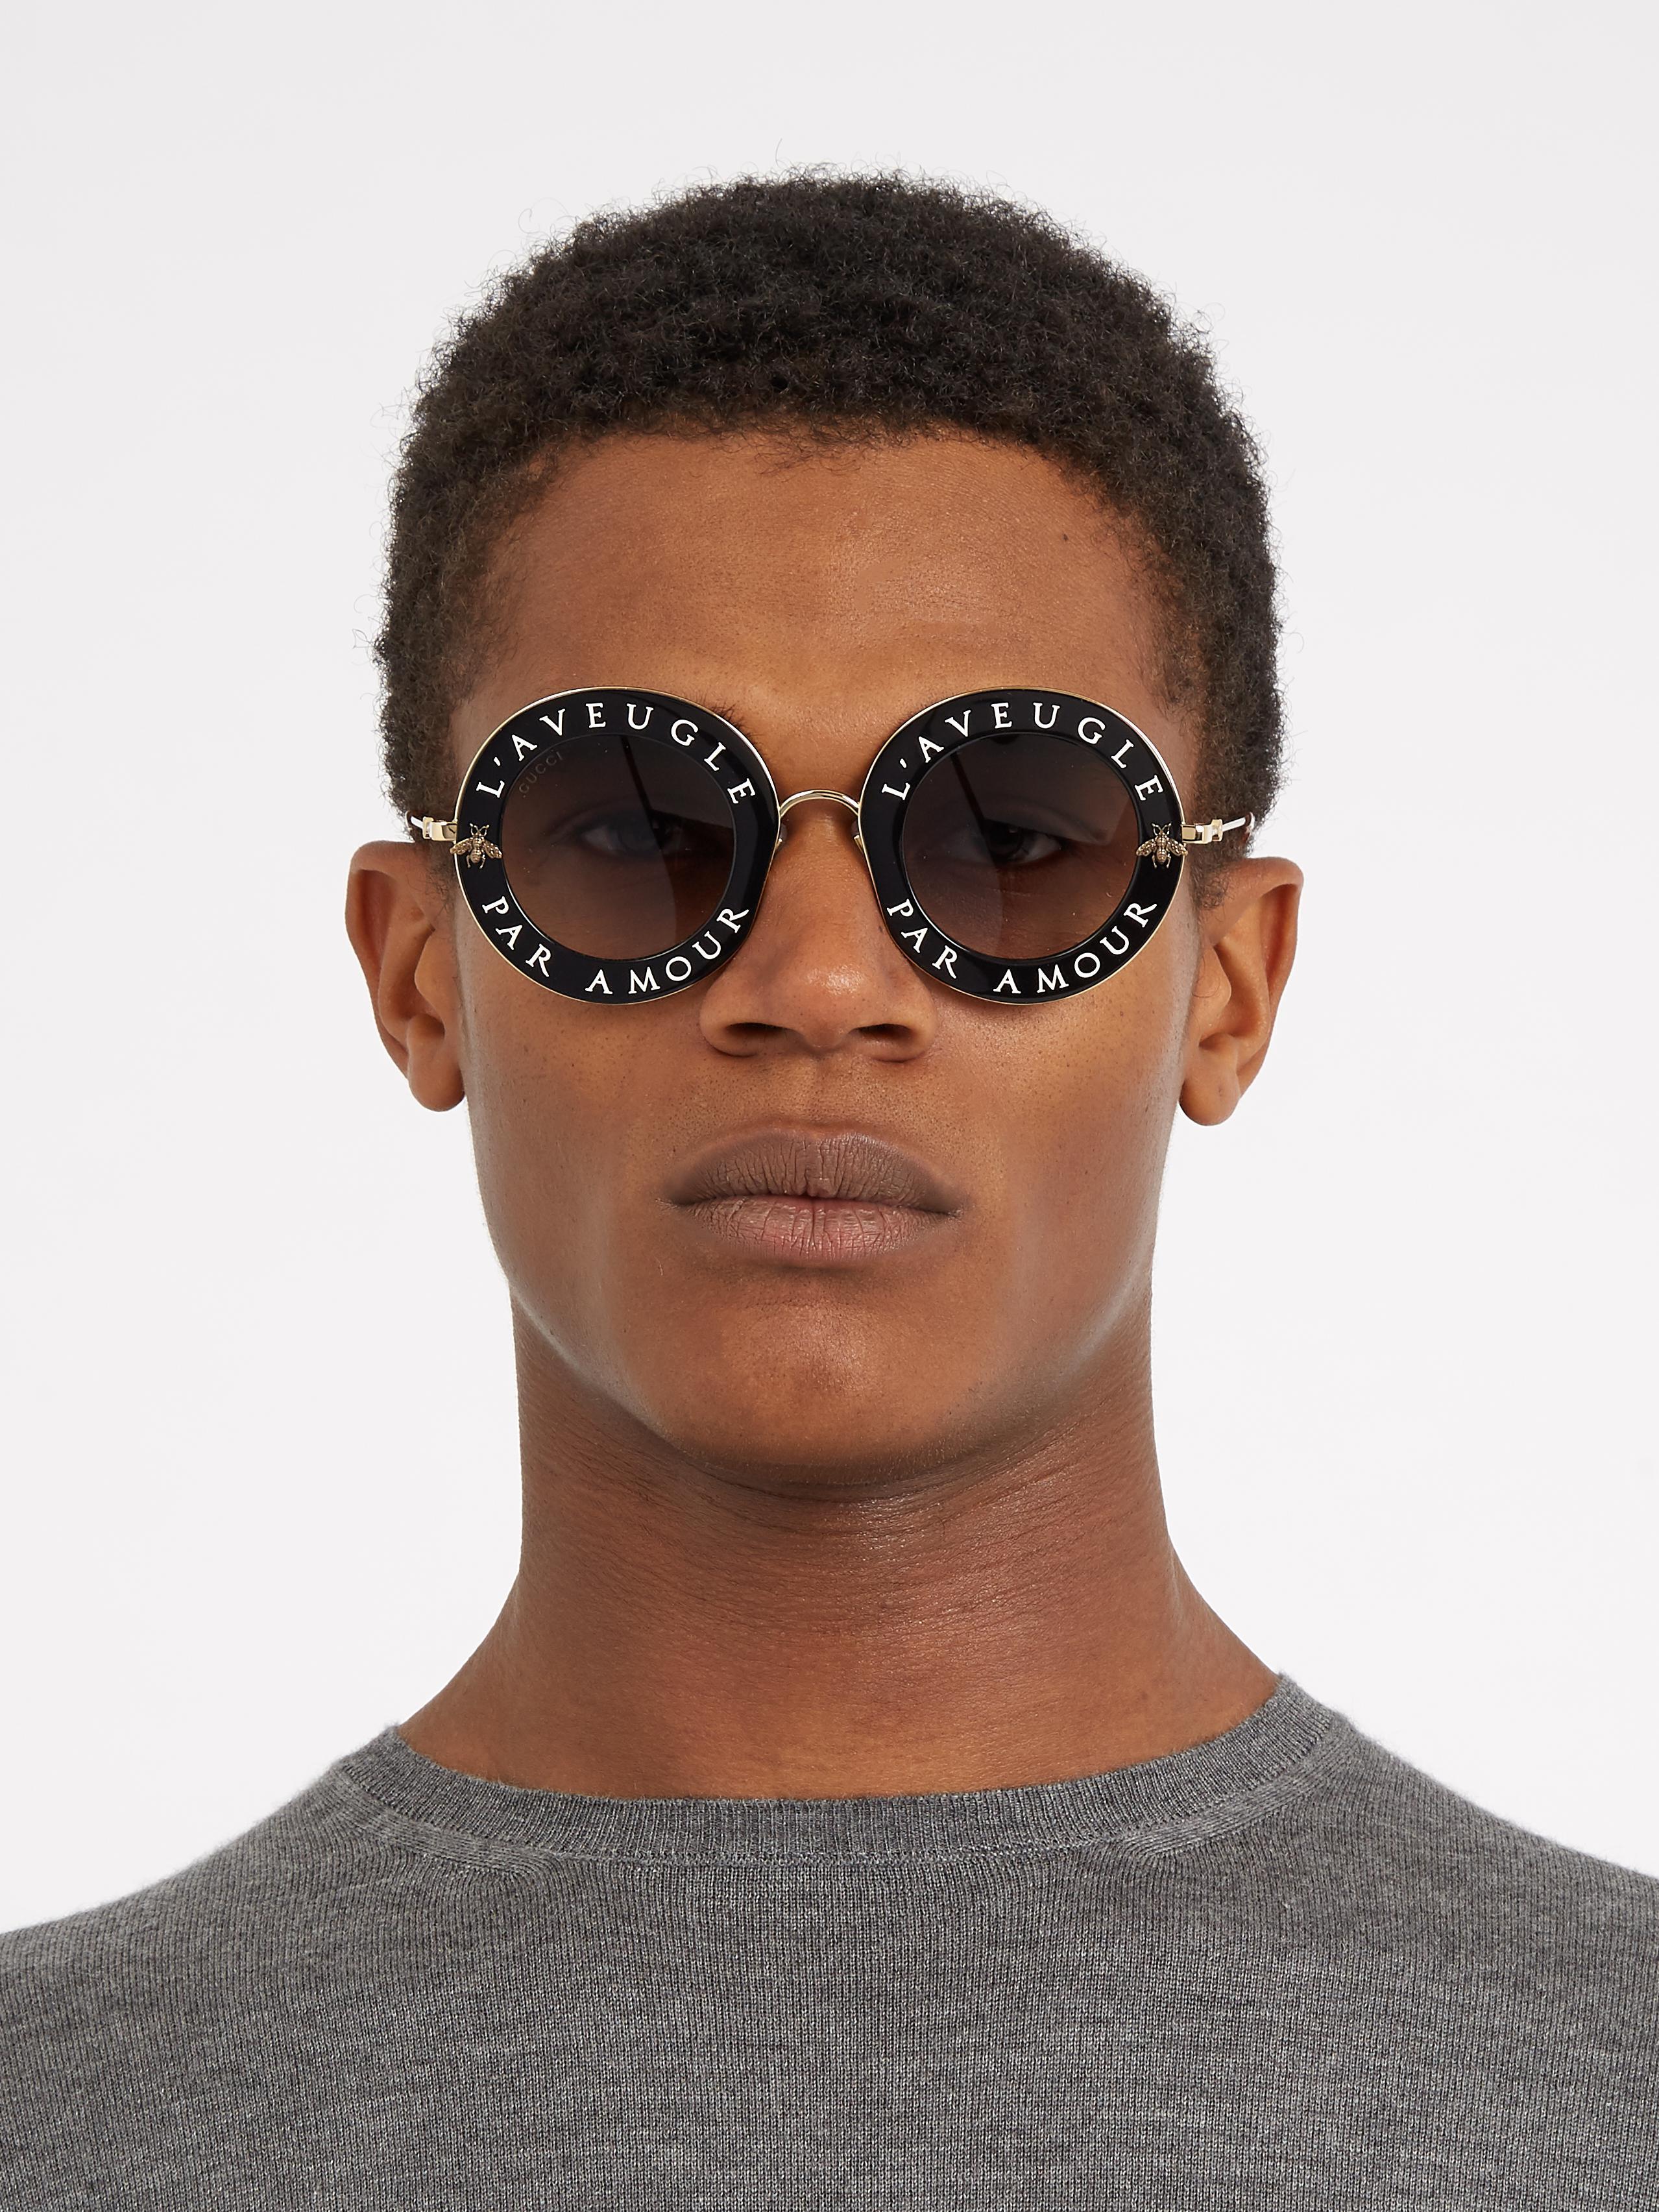 4721ef9e39e Lyst - Gucci L aveugle Par Amour Round-frame Sunglasses in Black for Men